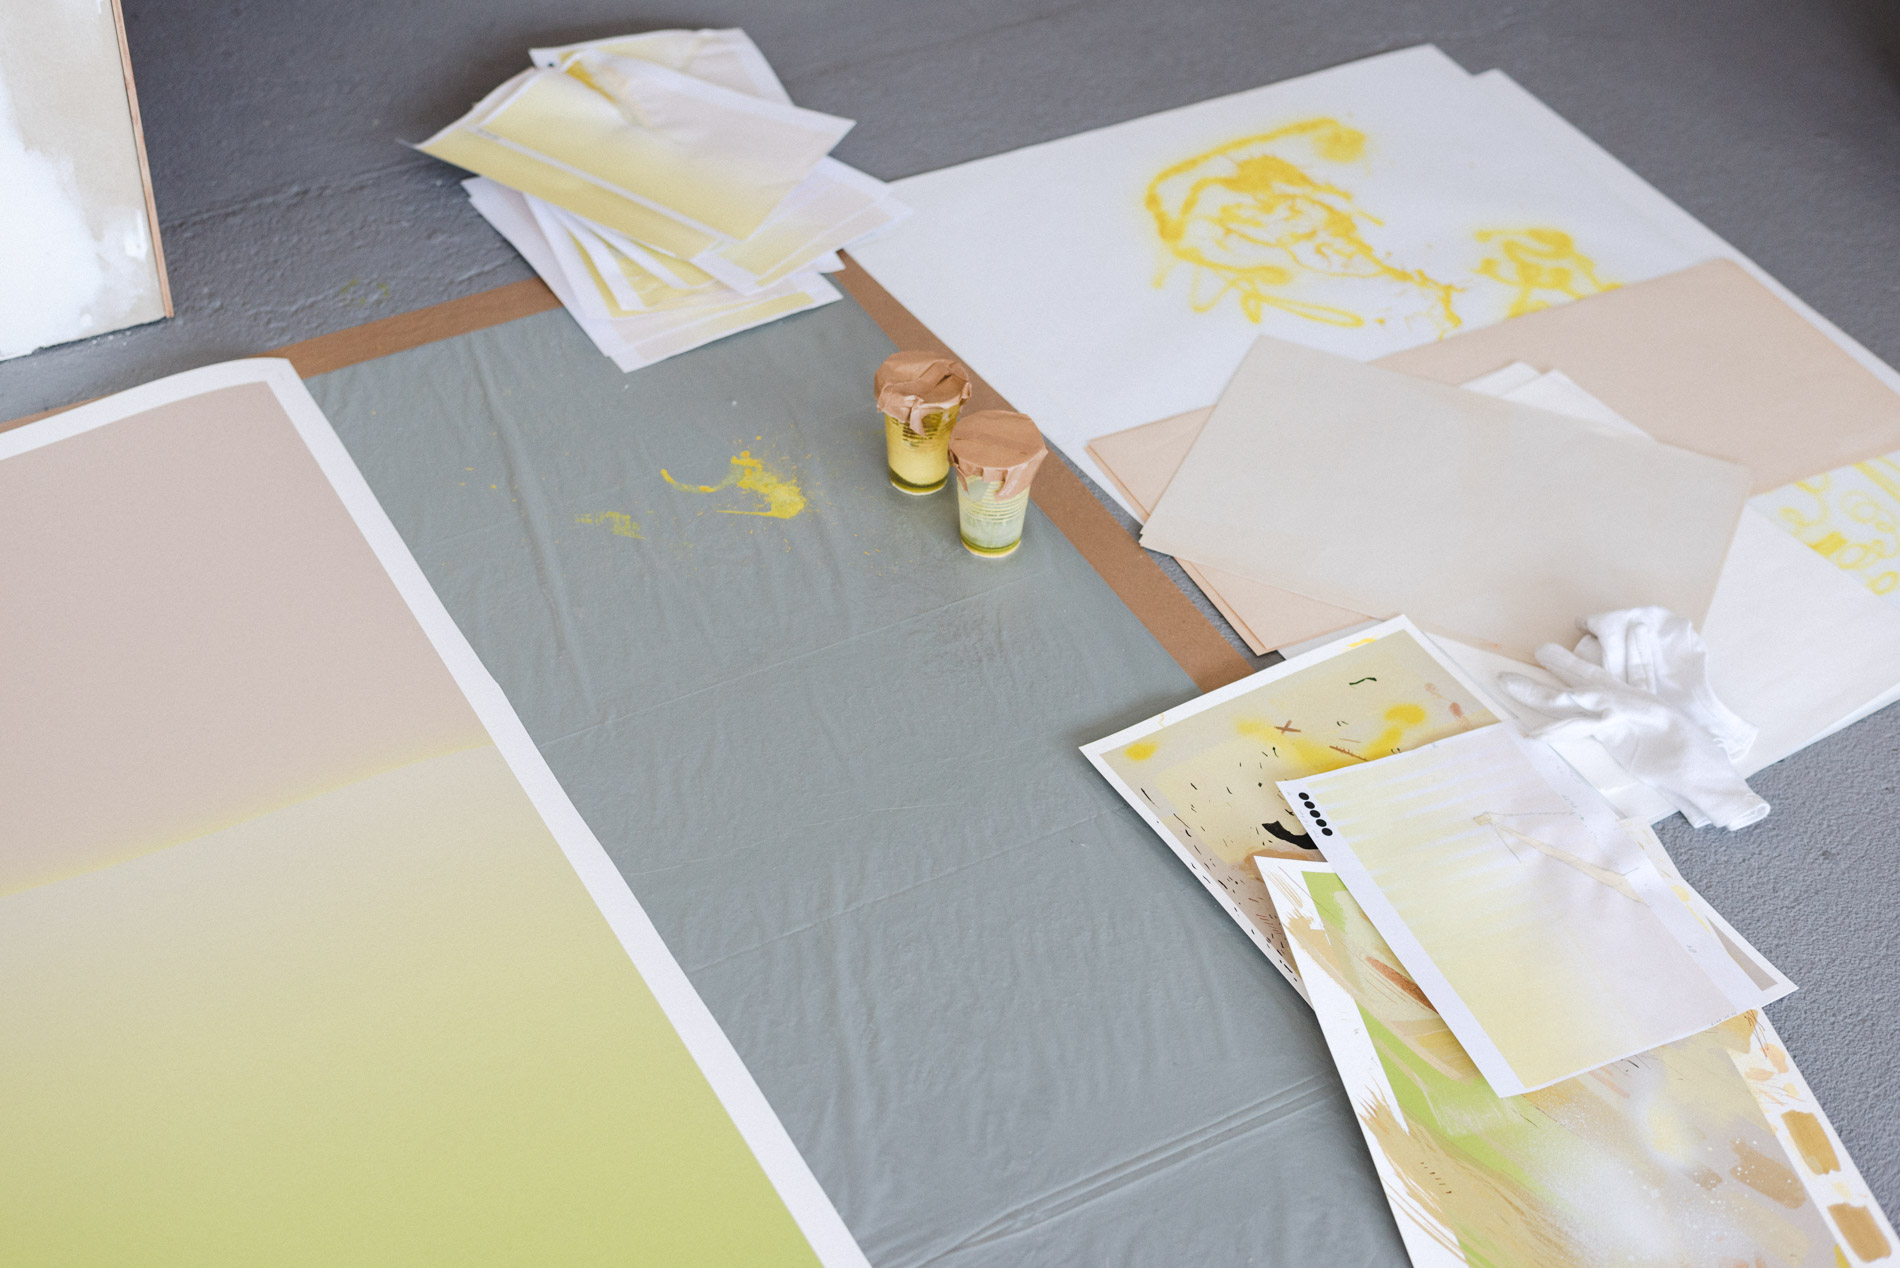 Cee-Cee-Creative-Anina-Brisolla-Studio-Visit-Low-Res-6962 Kopie.jpg